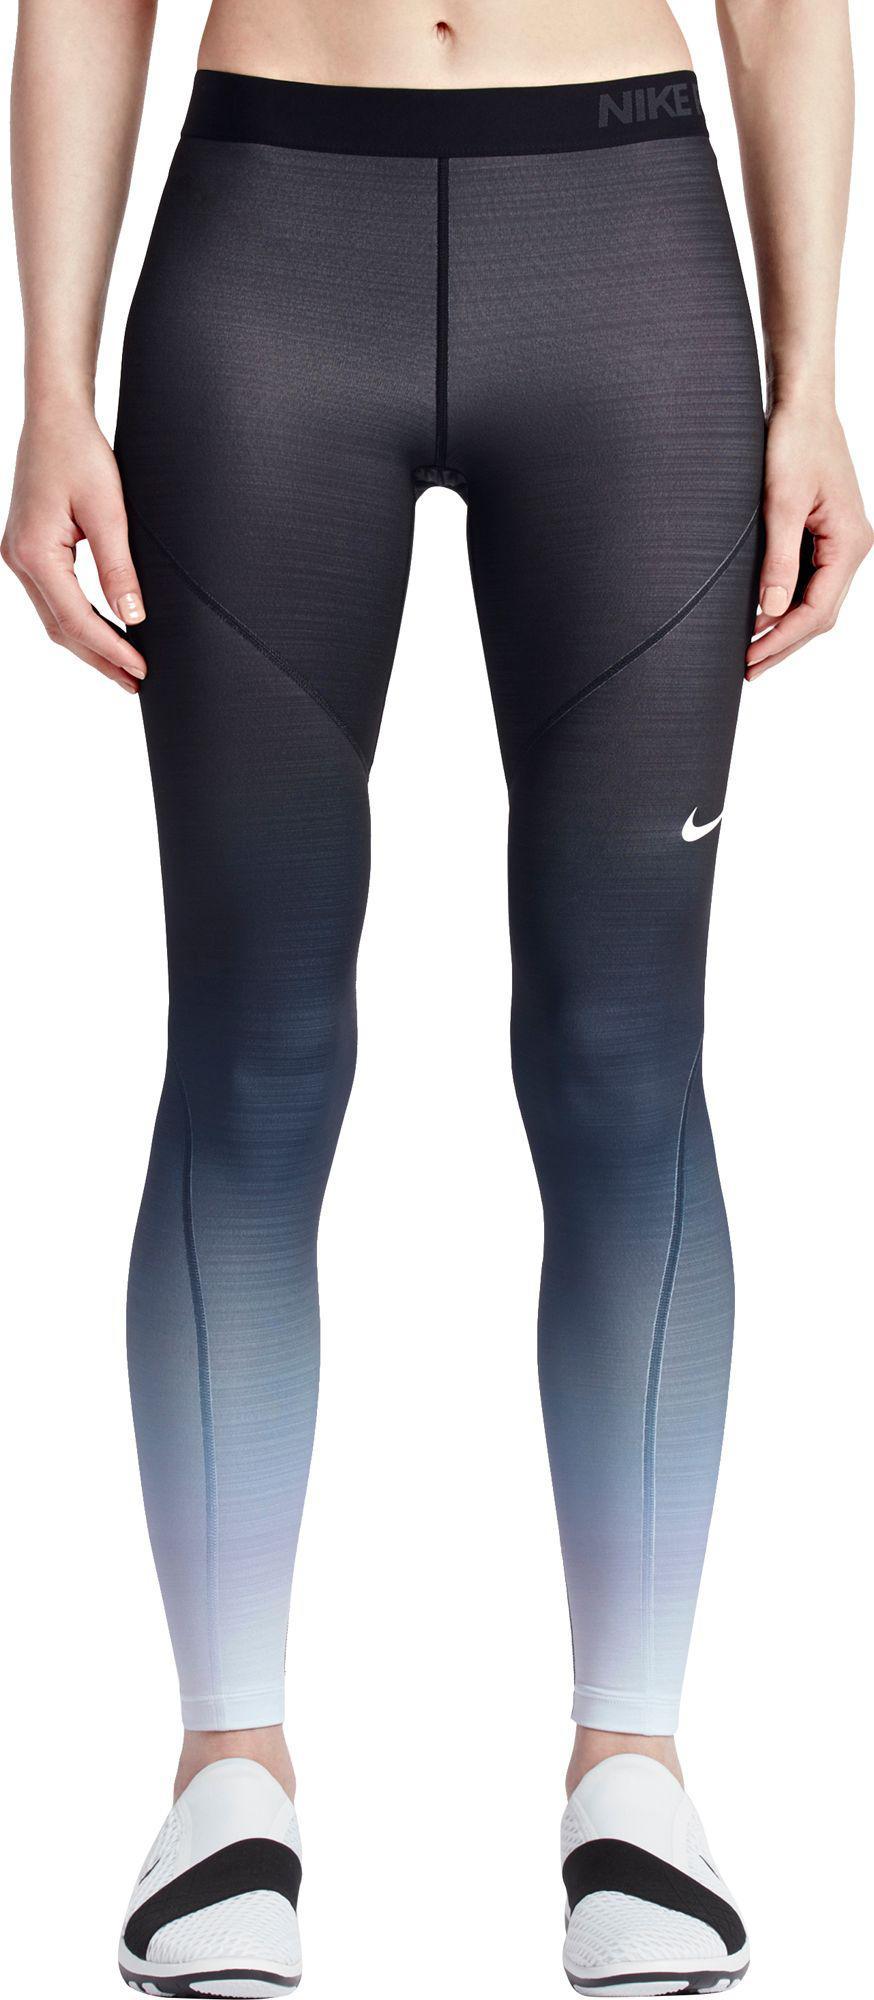 3f4e2795106de8 Nike Pro Hyperwarm Fade Printed Tights in Black - Lyst